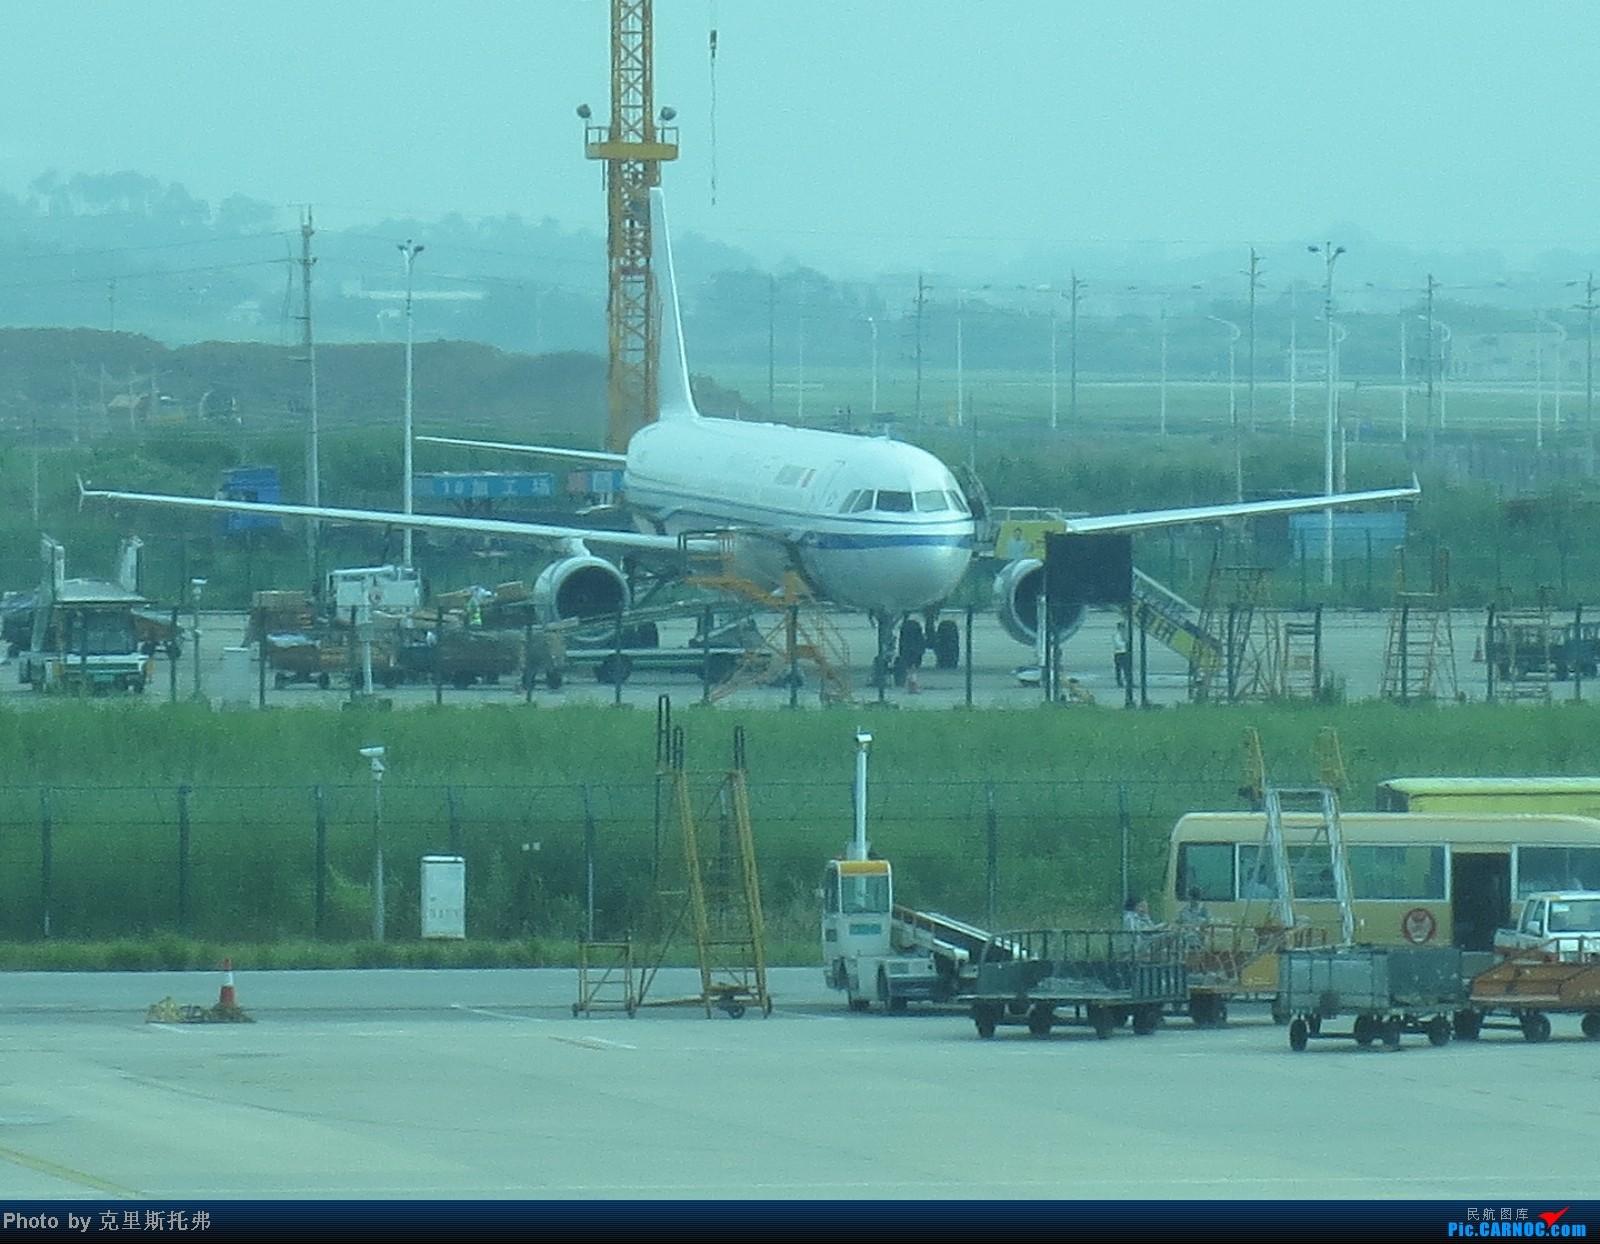 Re:[原创]【广州,你好!】八月齐鲁行 第一集 {初到齐鲁城} 不期而遇,鹏程行万里 相伴相惜,享飞行至美 A320